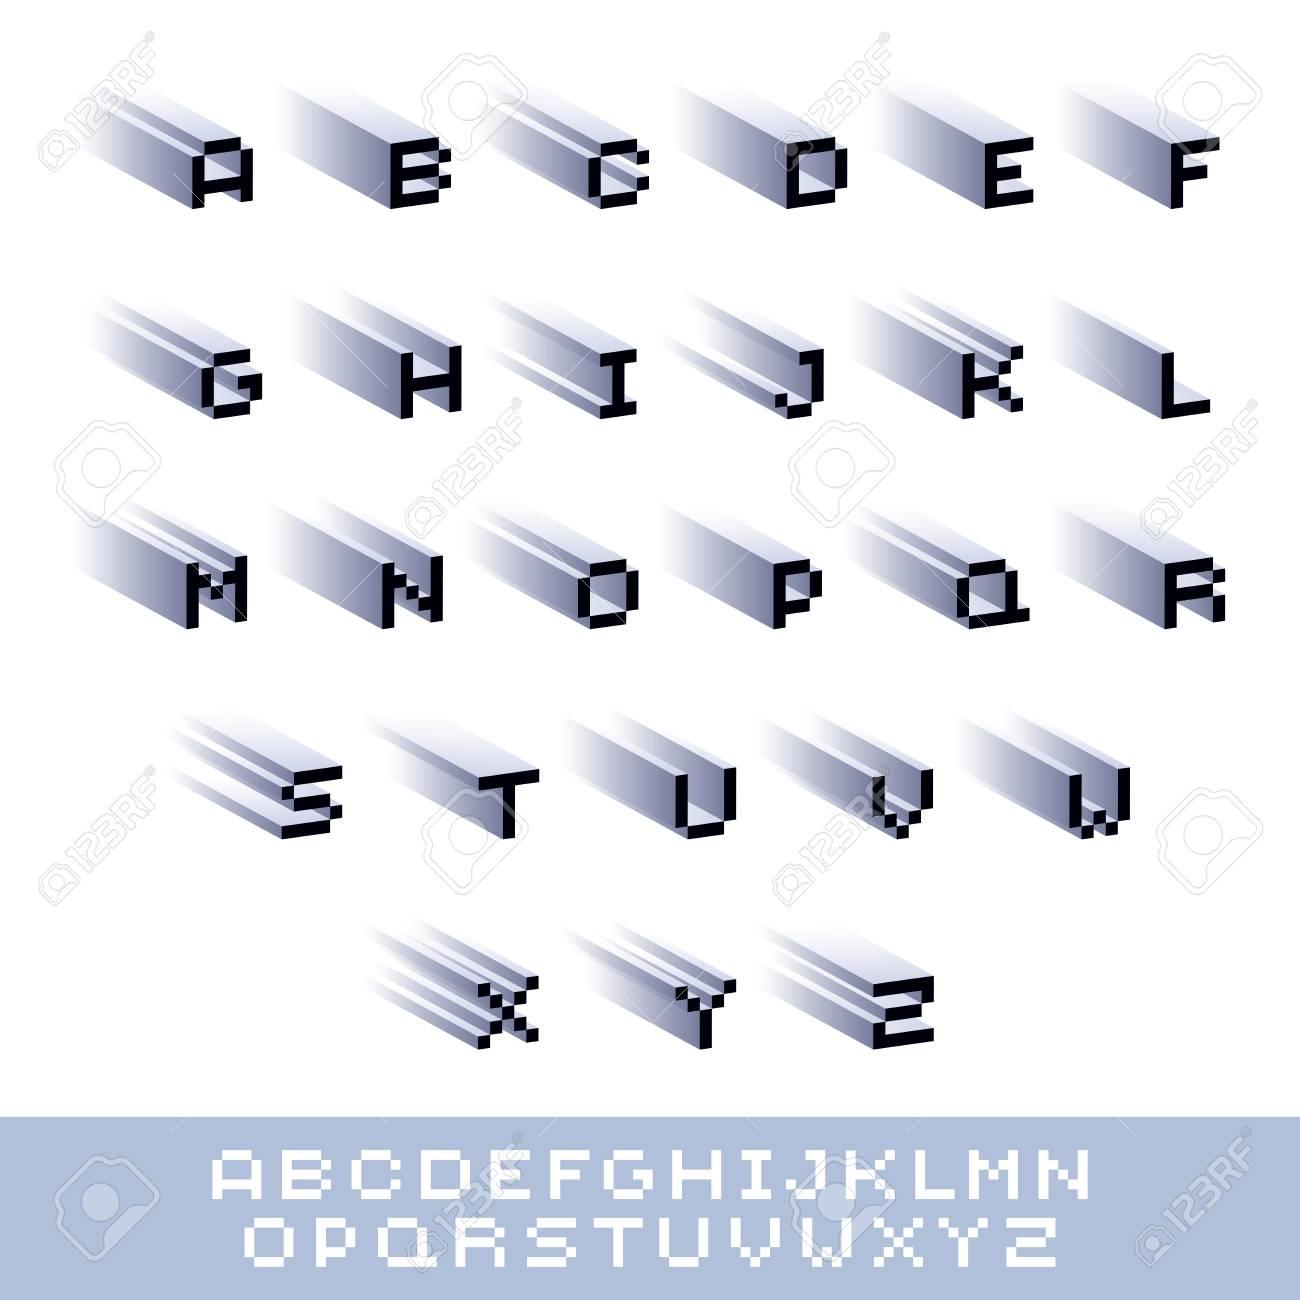 Cybernetic 3d alphabet letters, pixel art vector digital typescript. Pixel design elements, contemporary